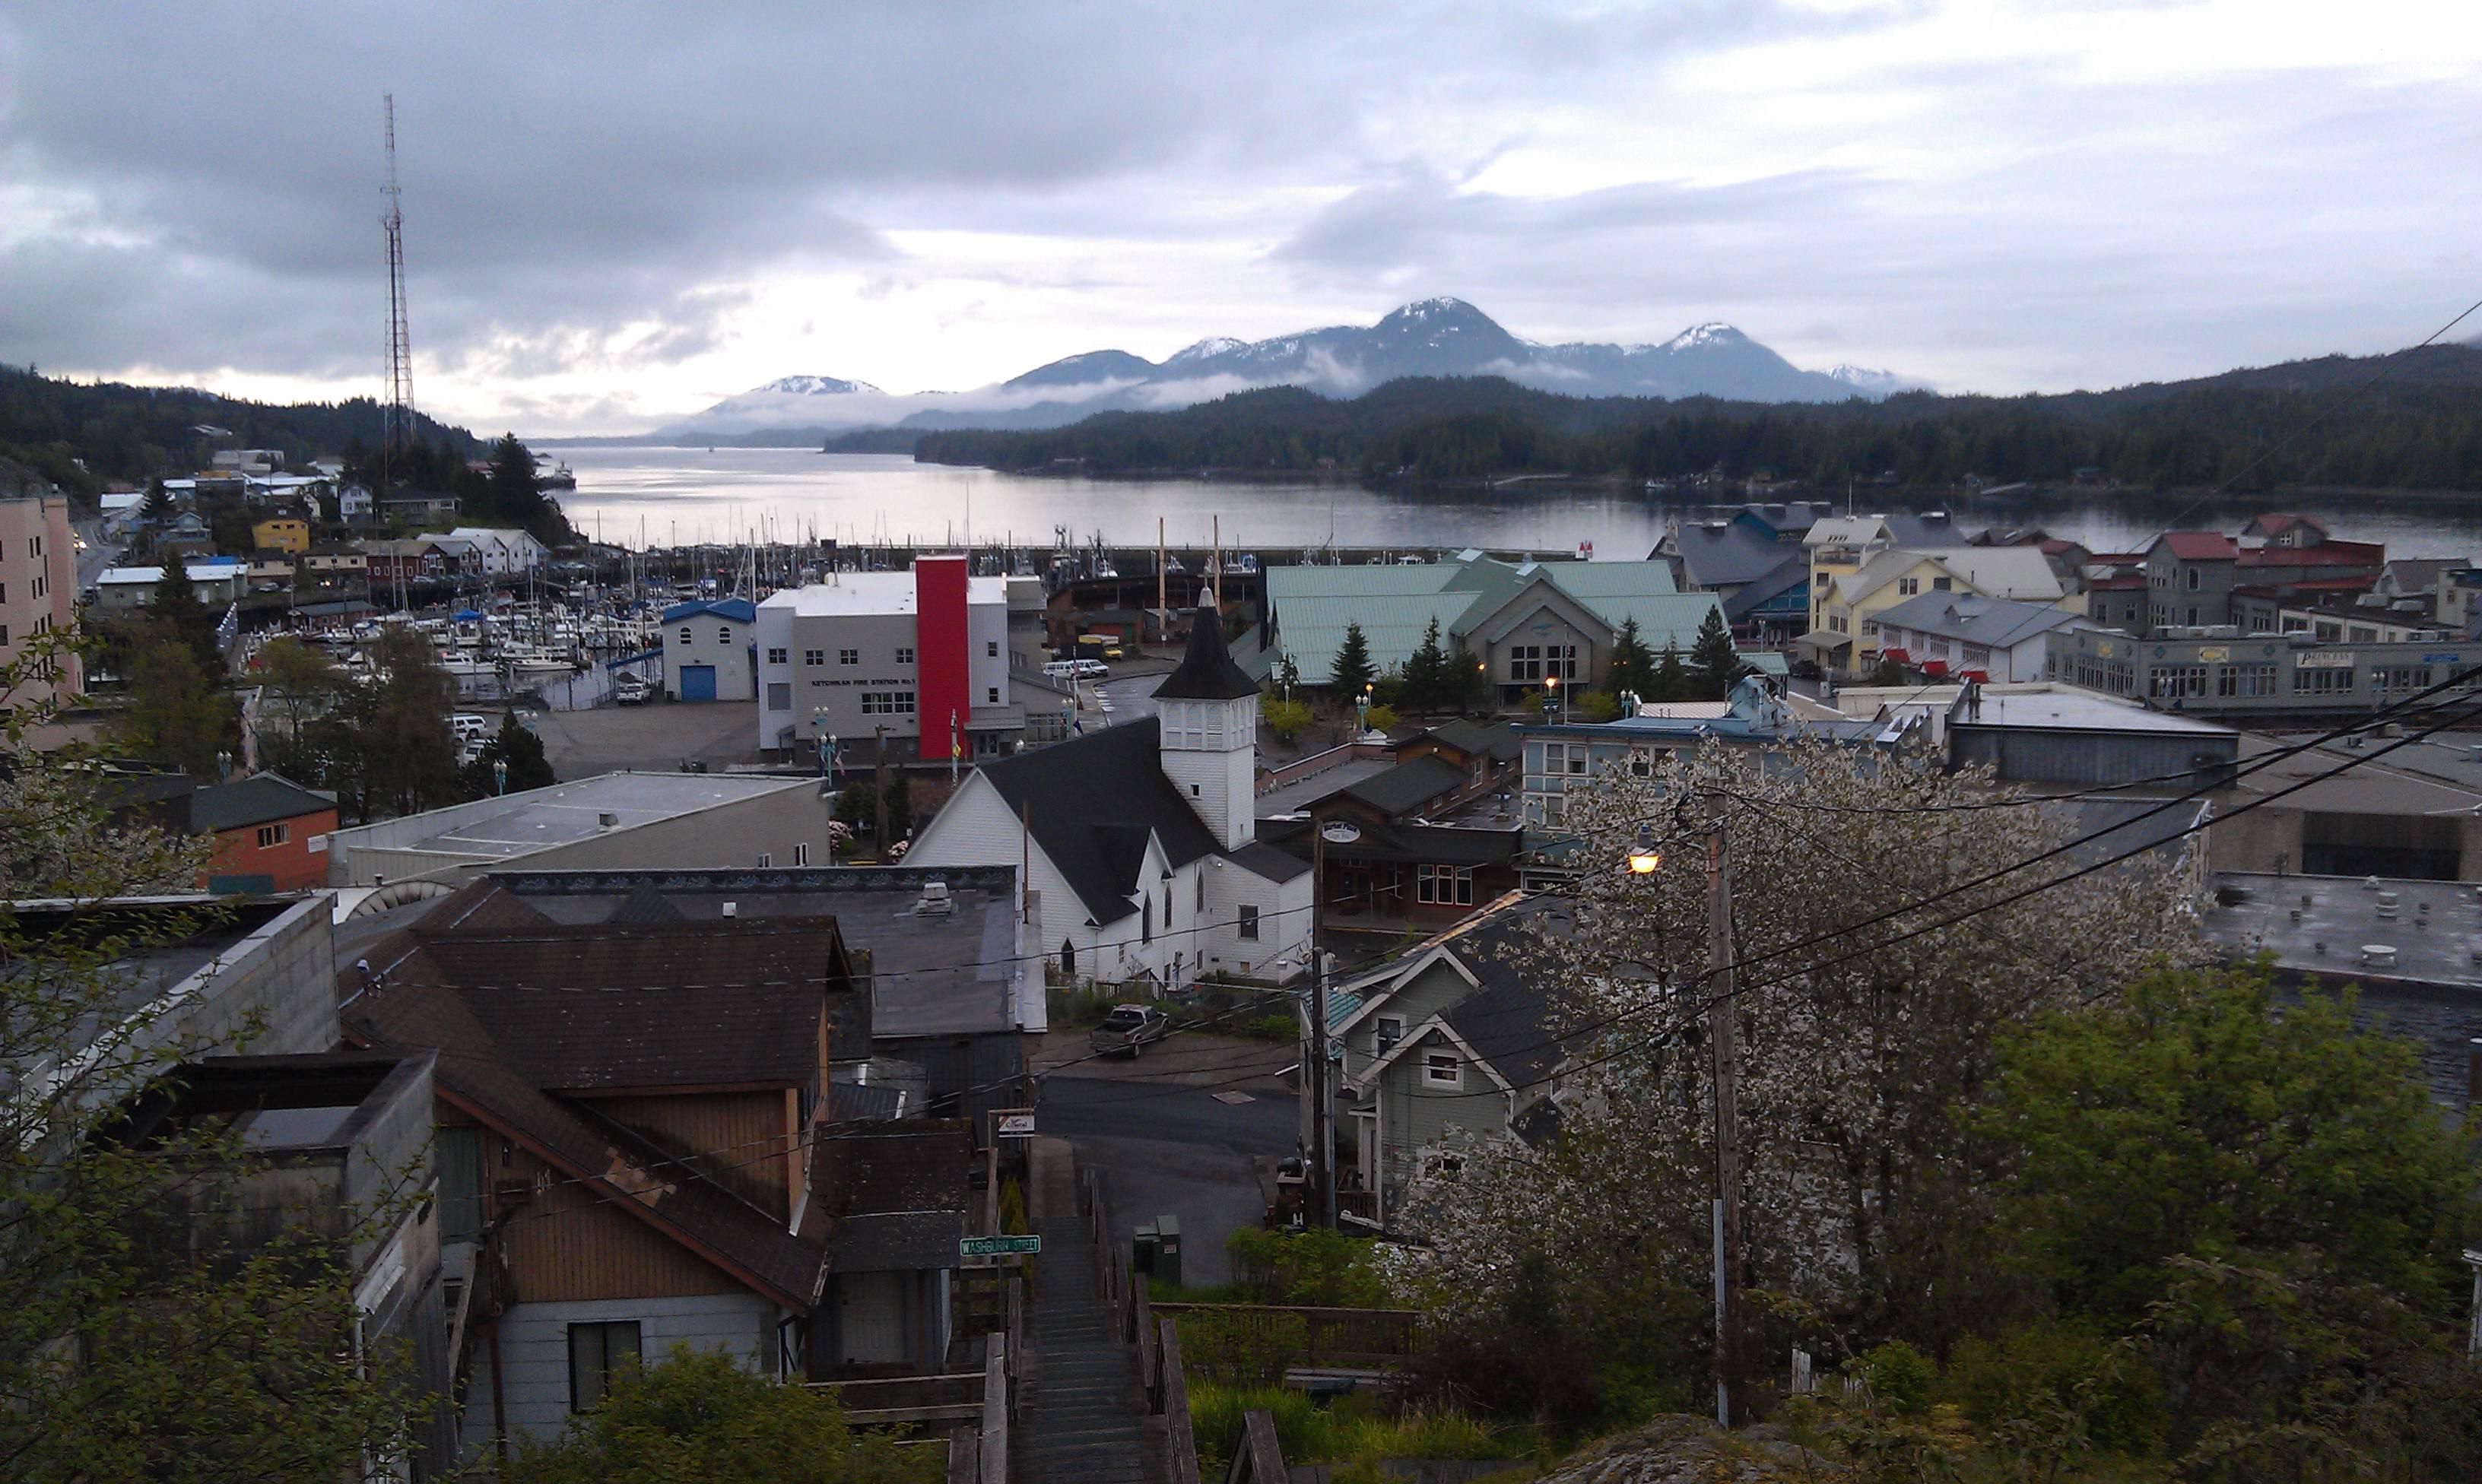 Morning view of Ketchikan, Alaska